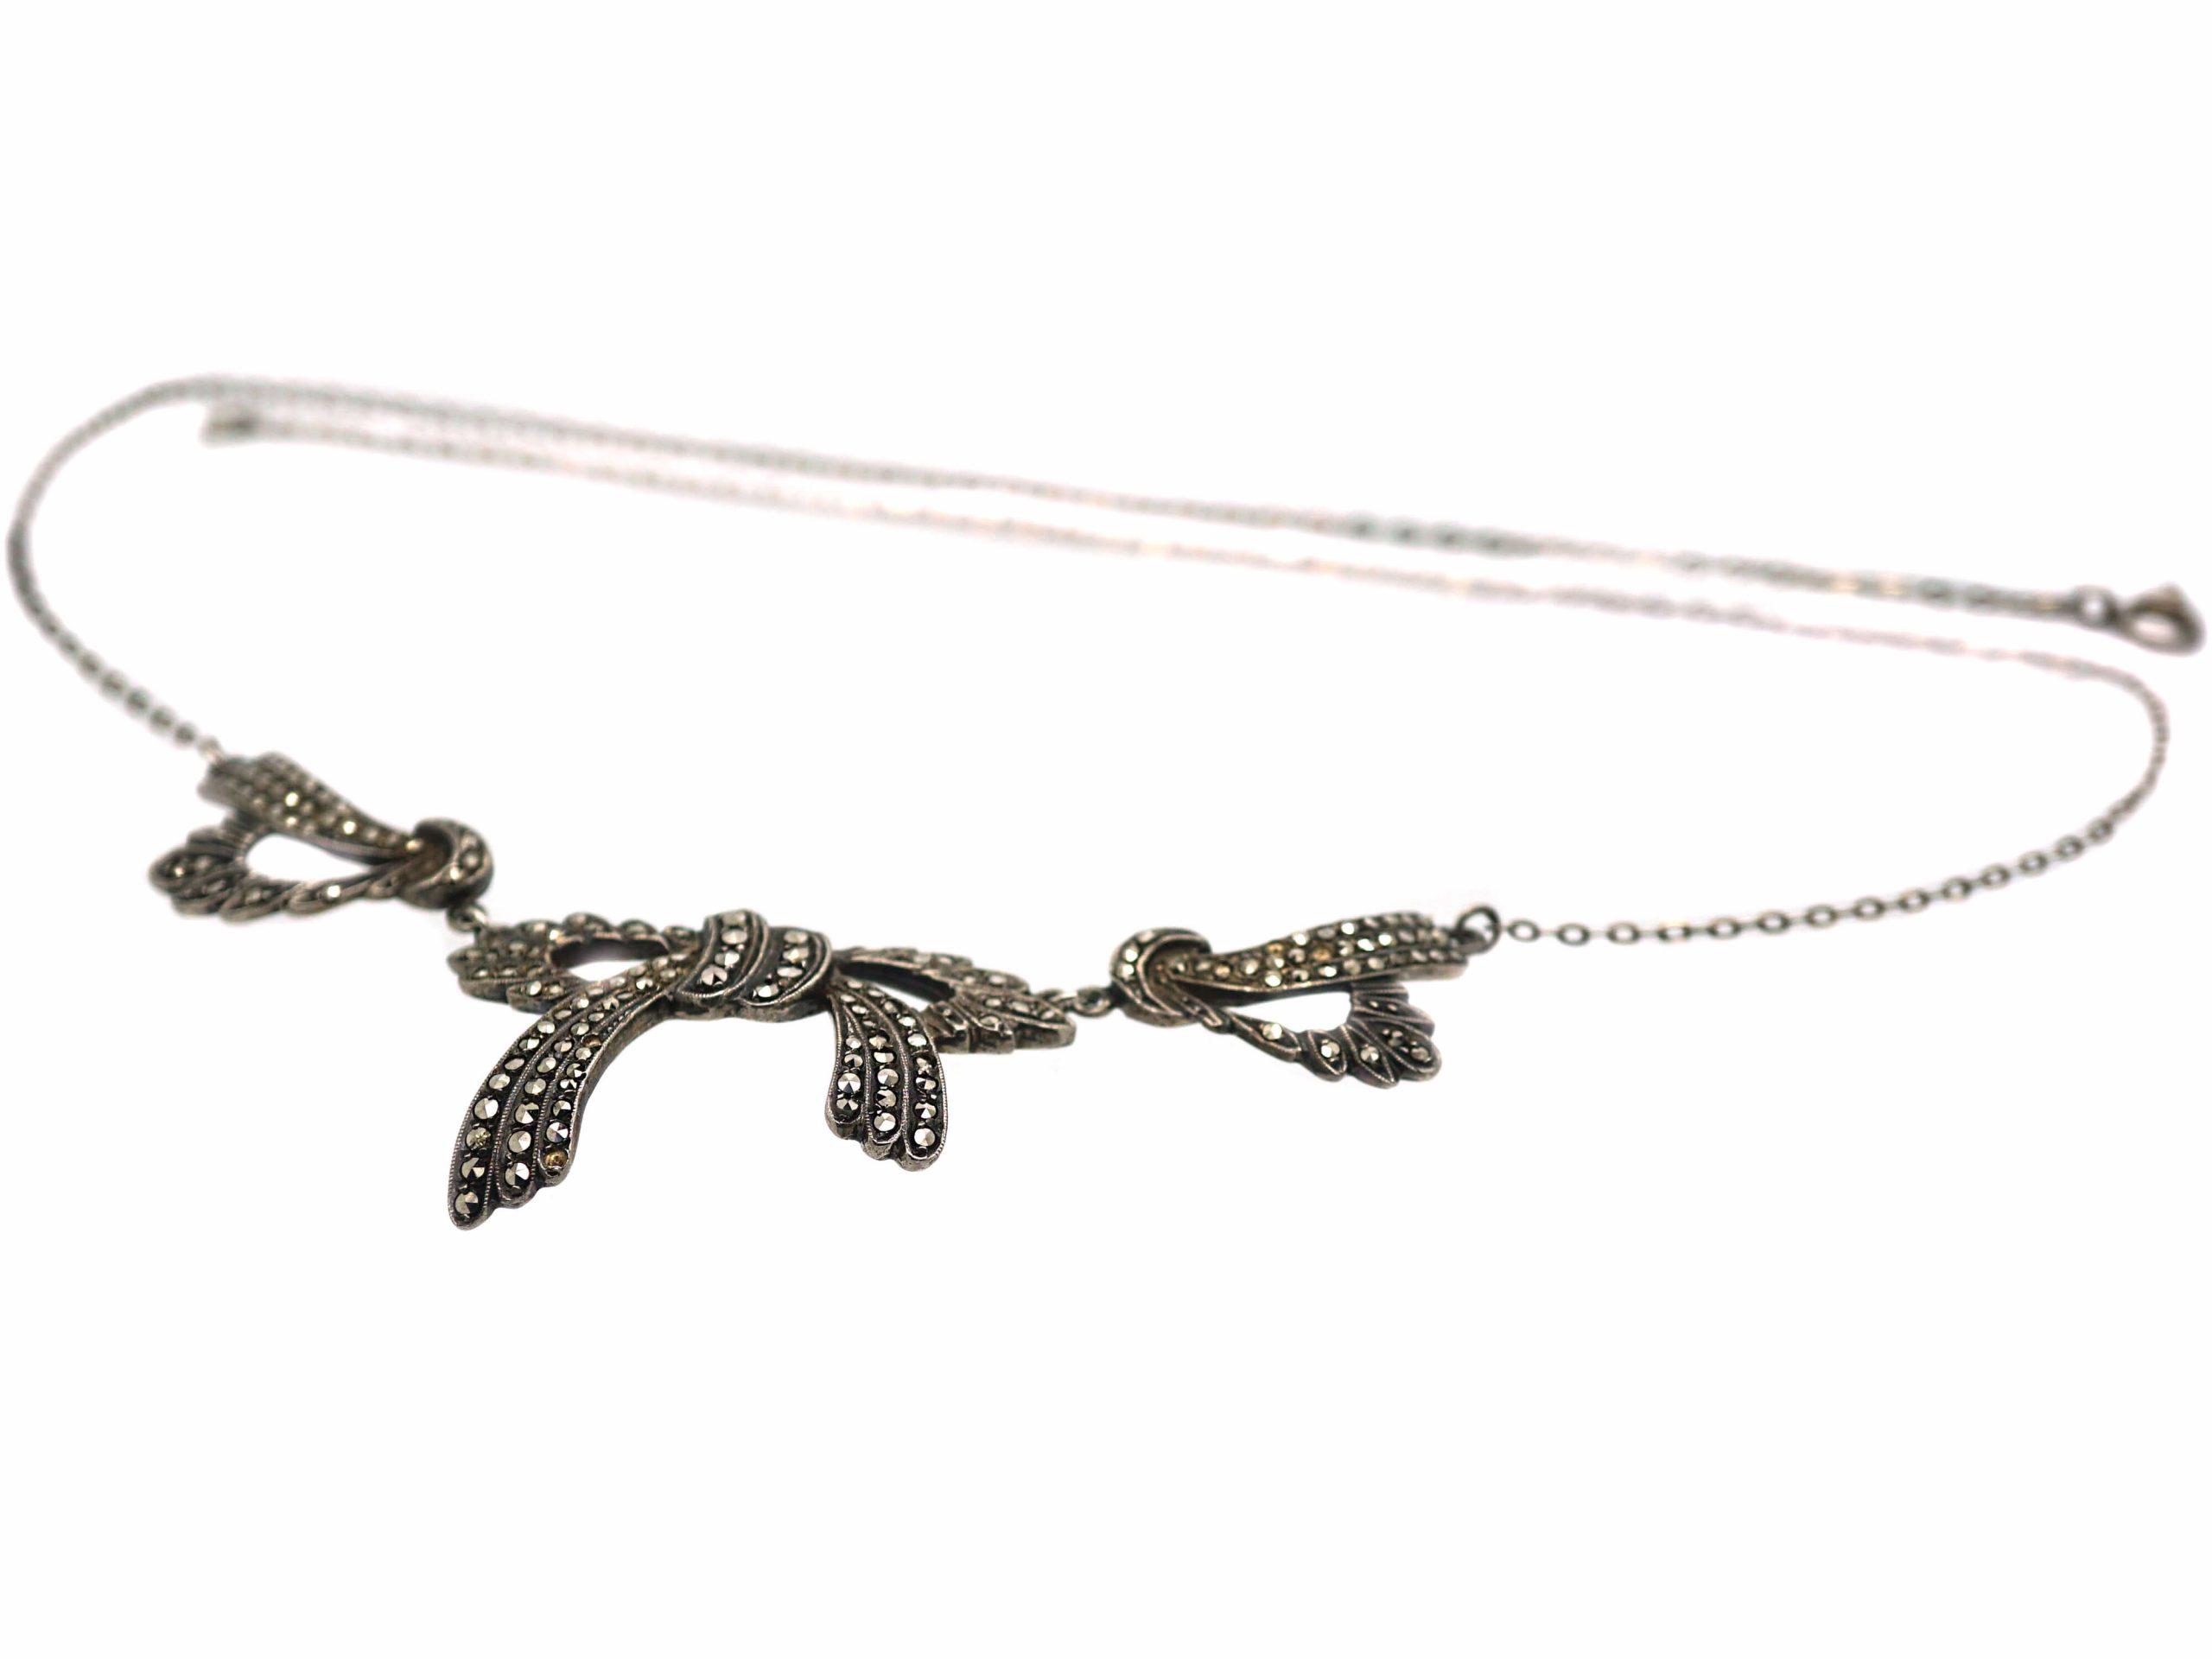 Art Deco Silver & Marcasite Bow Necklace